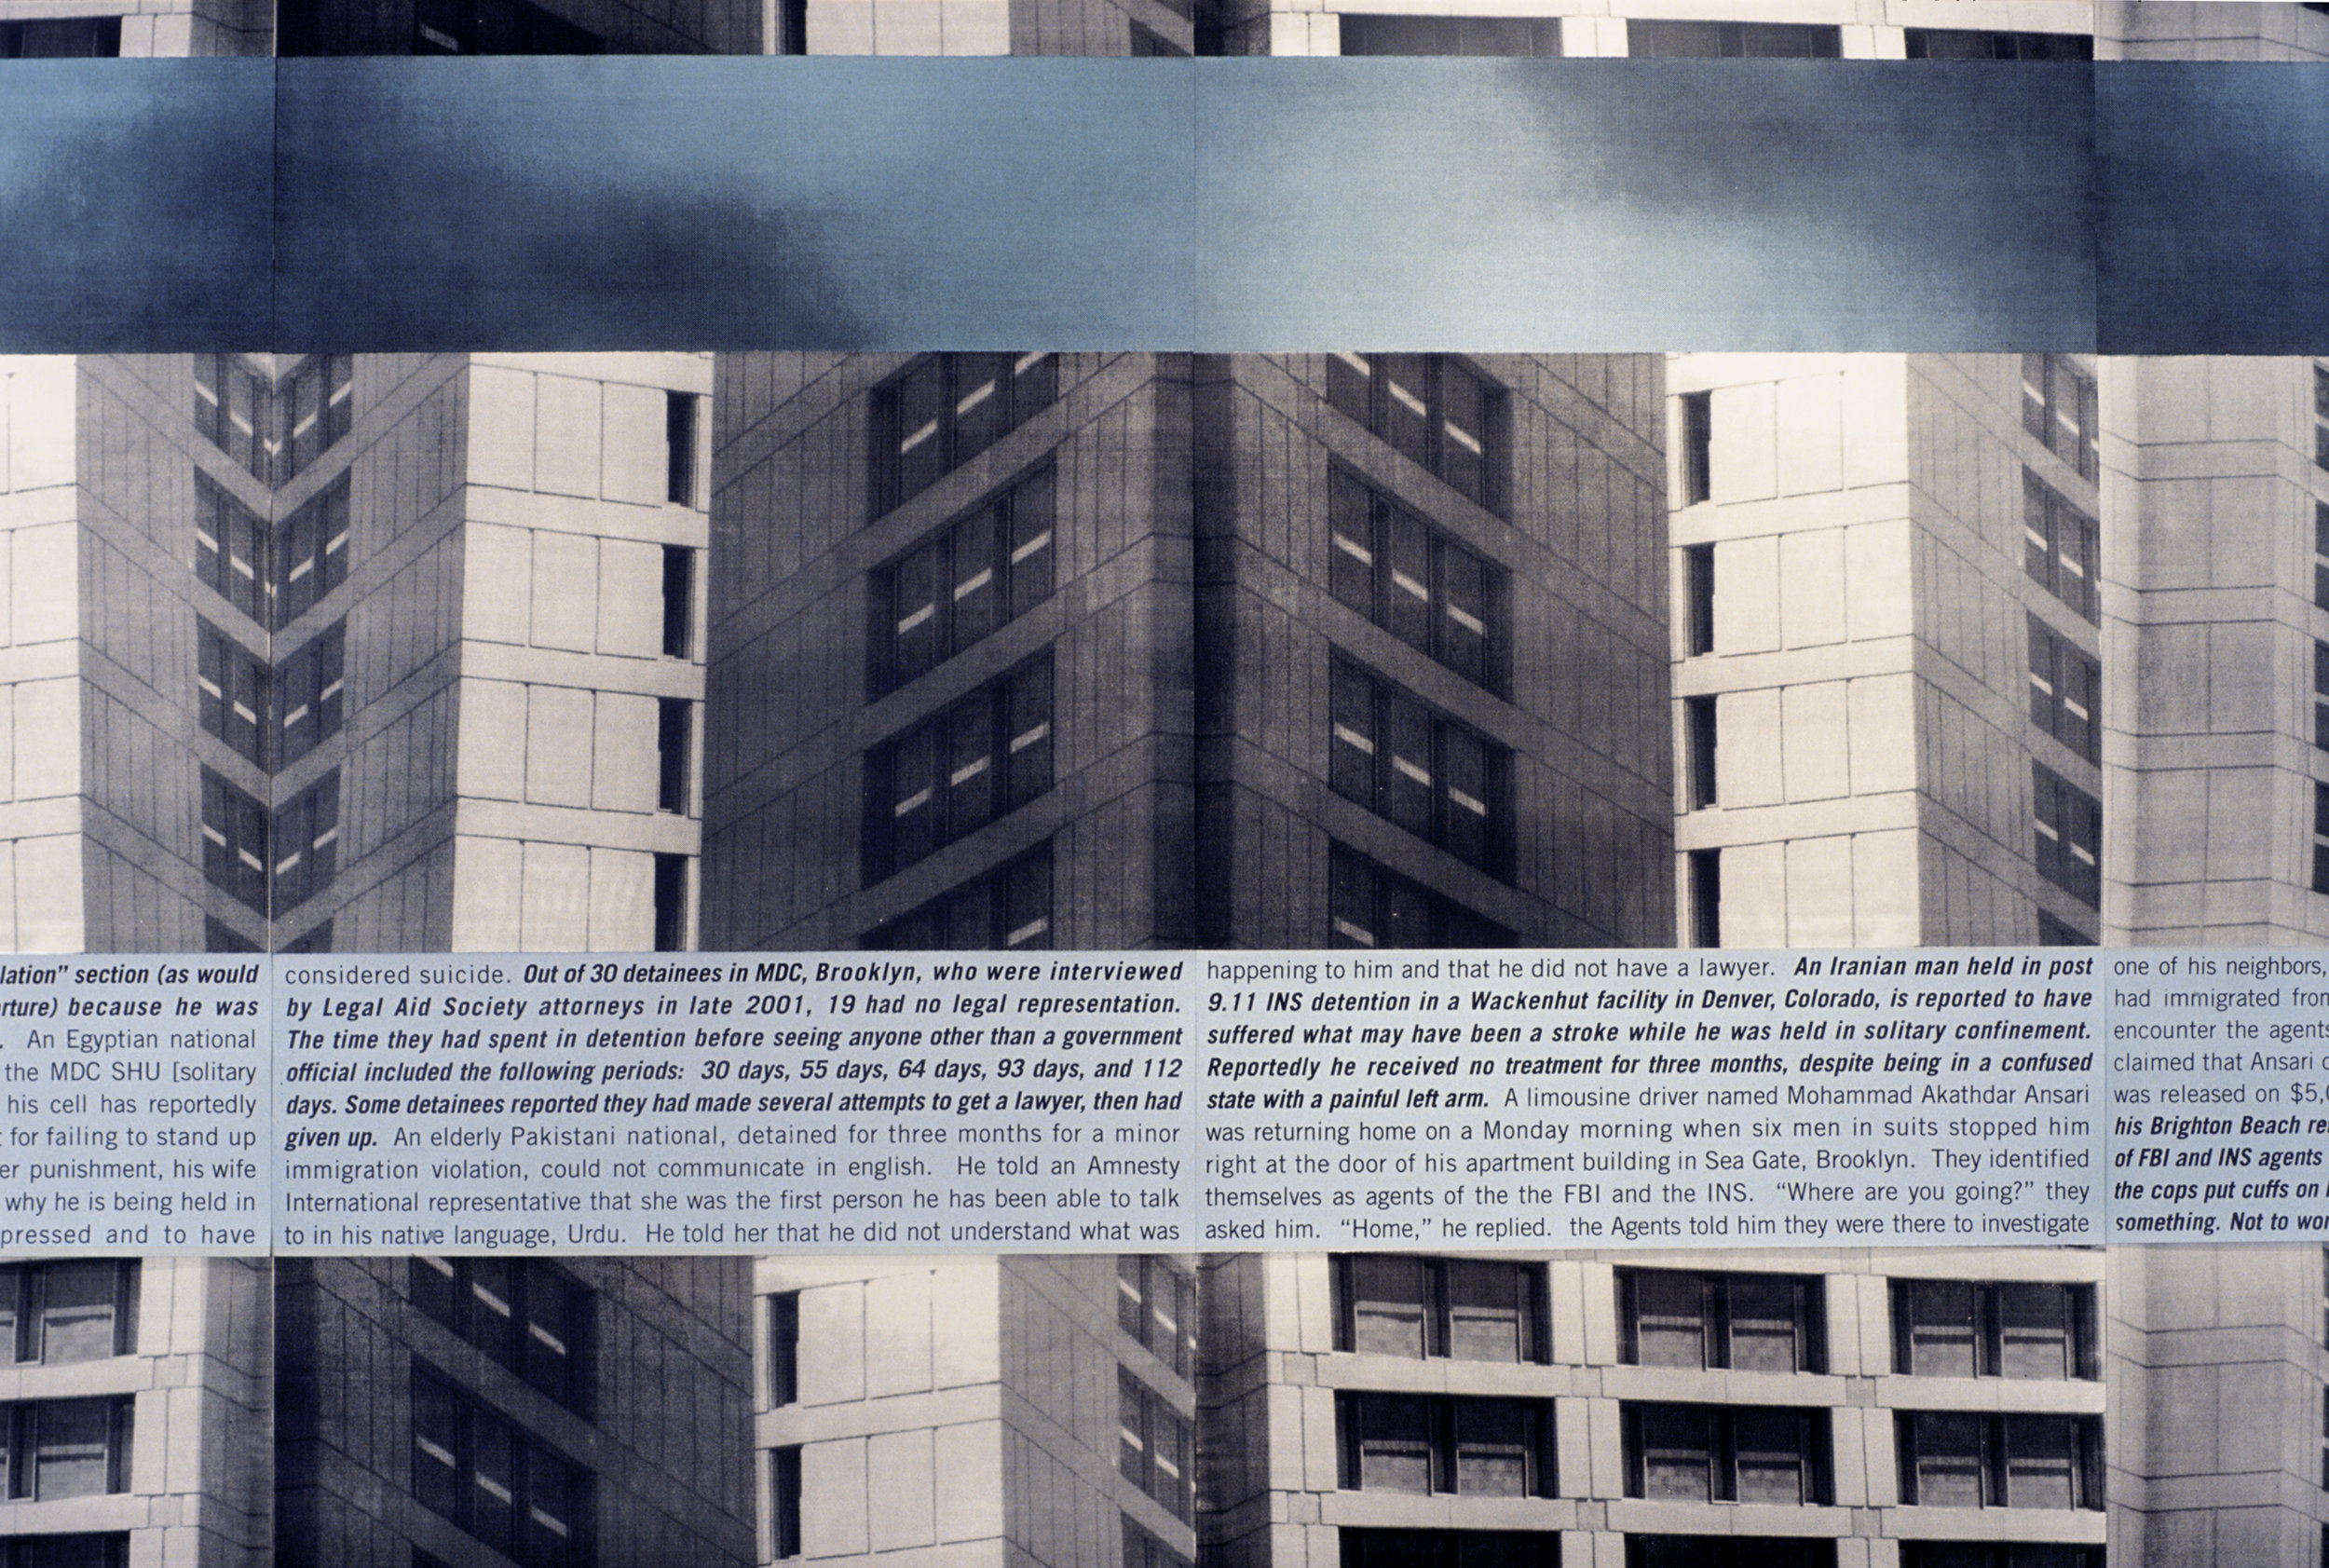 Metropolitan Detention Center, detail